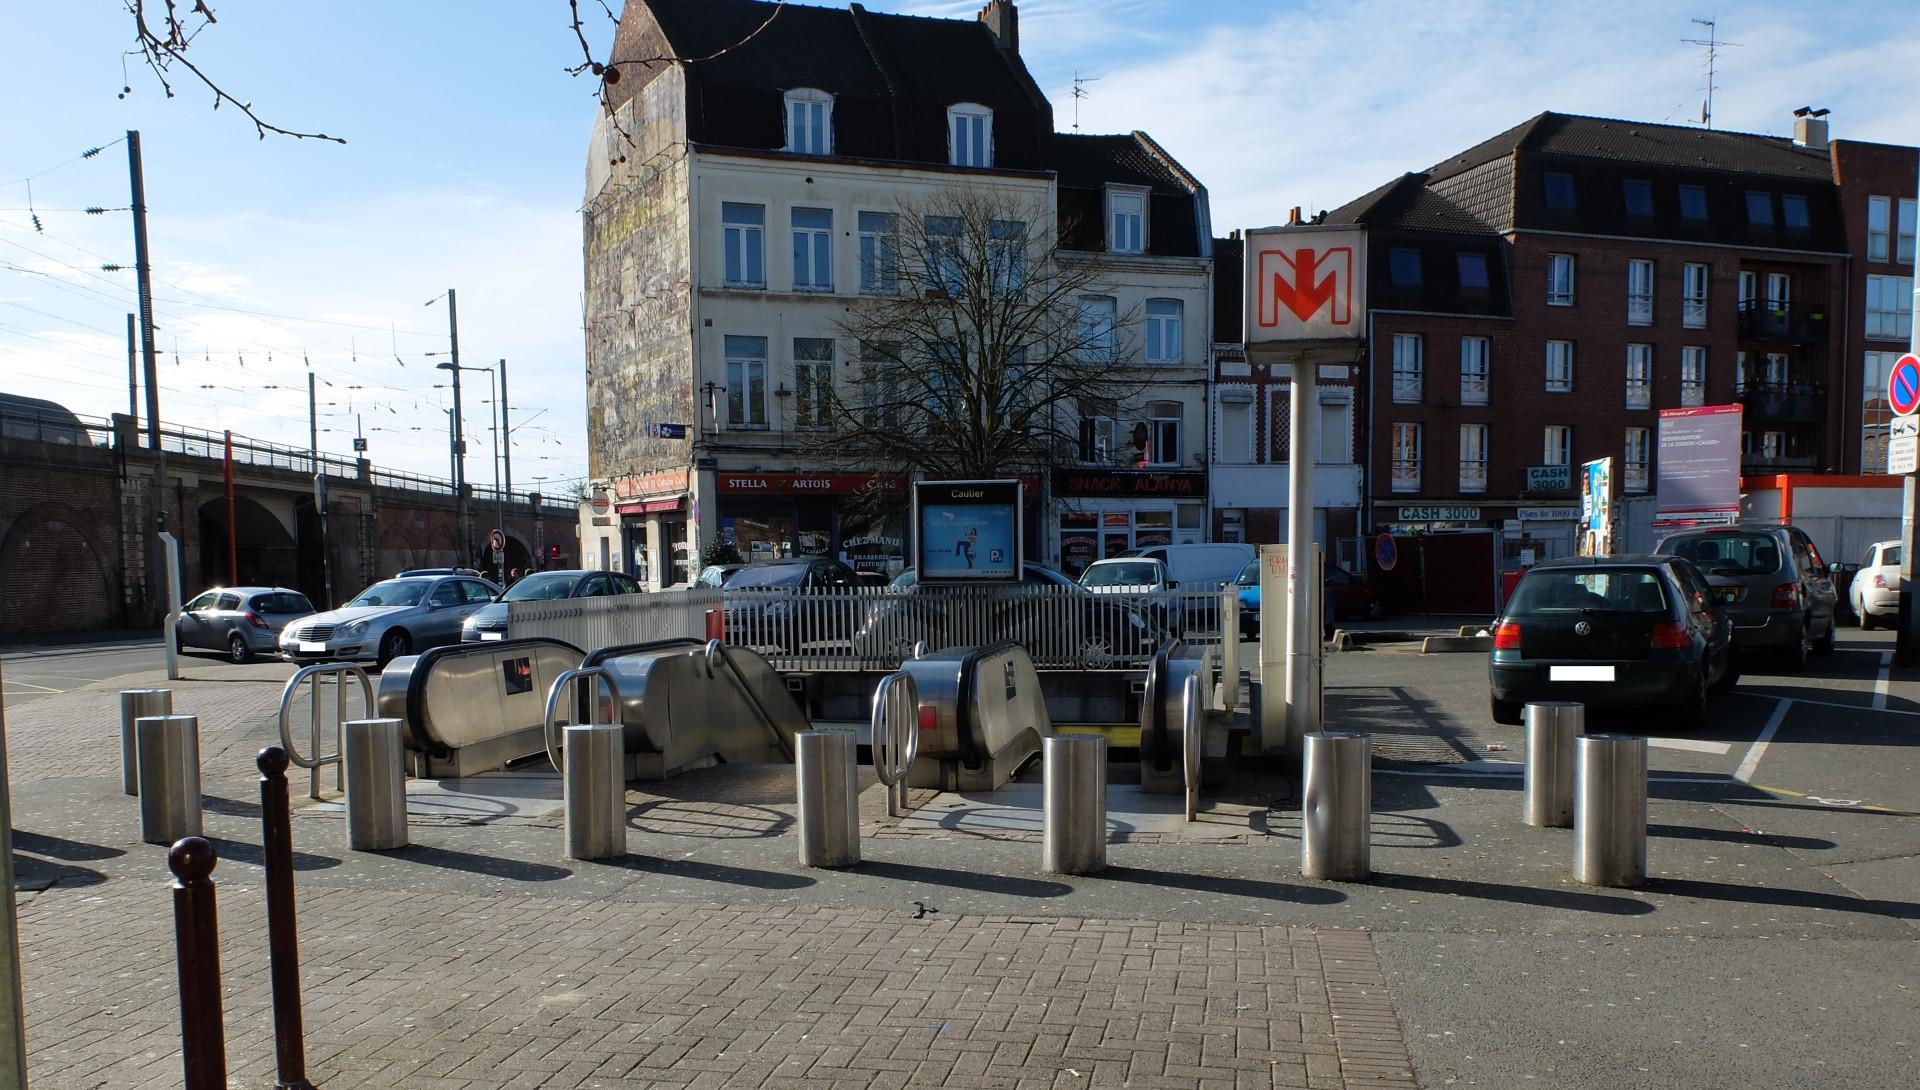 Metro Caulier Lille